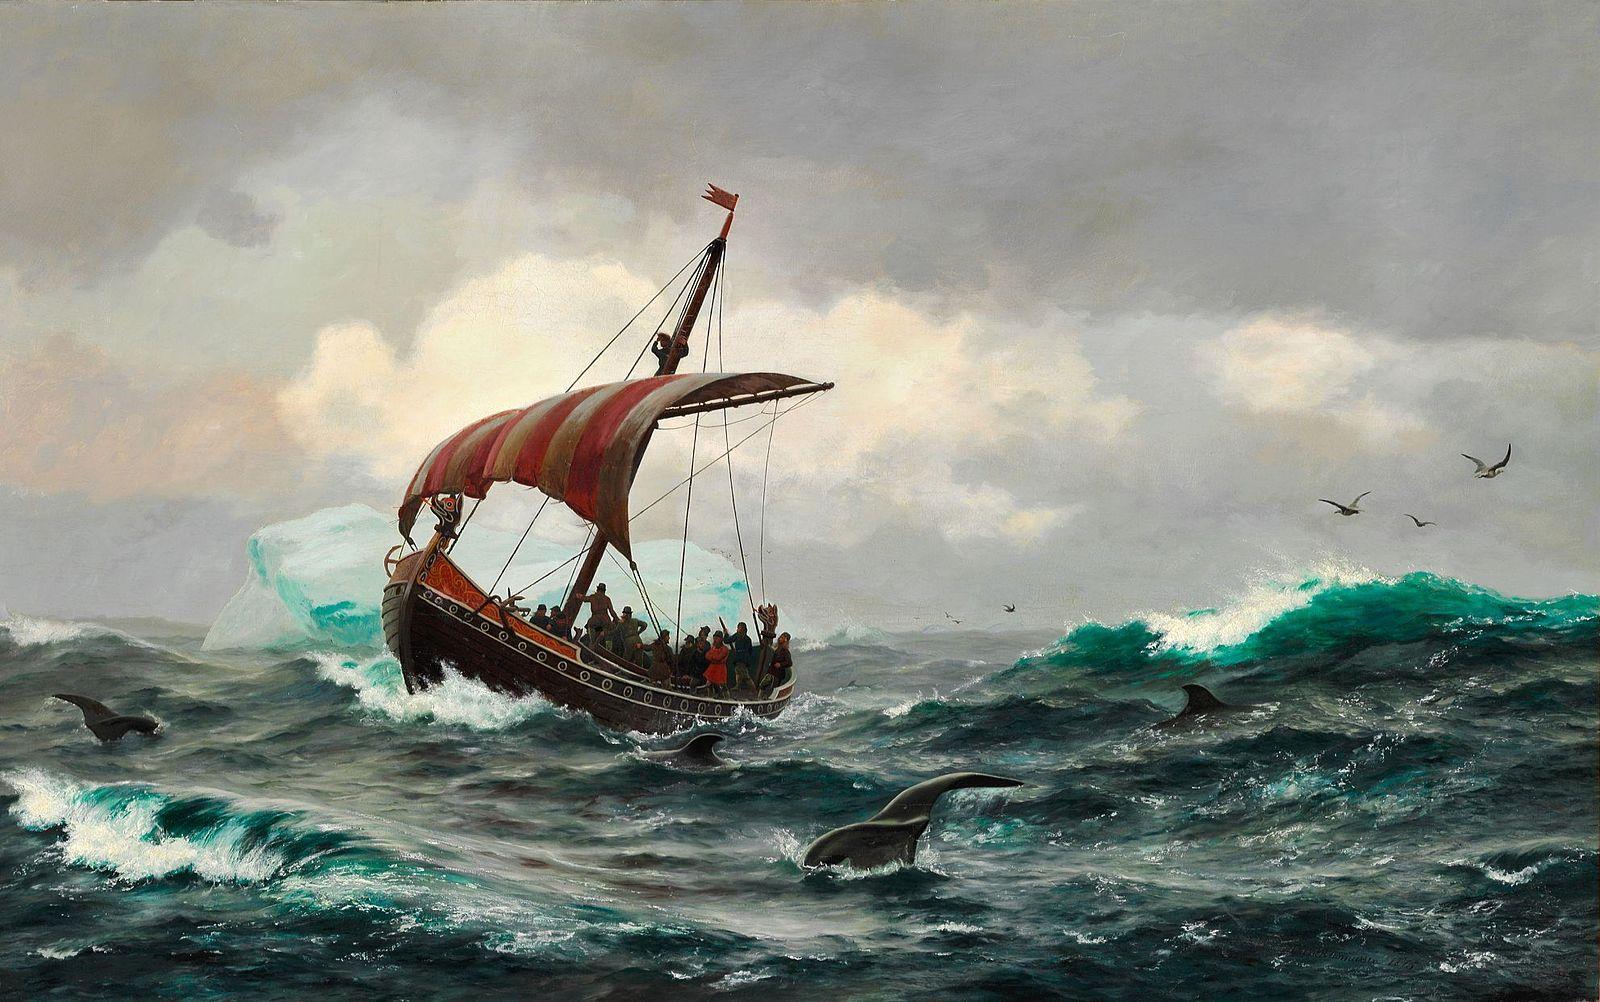 Vikings. Summer in the Greenland coast circa year 1000.    Public Domain